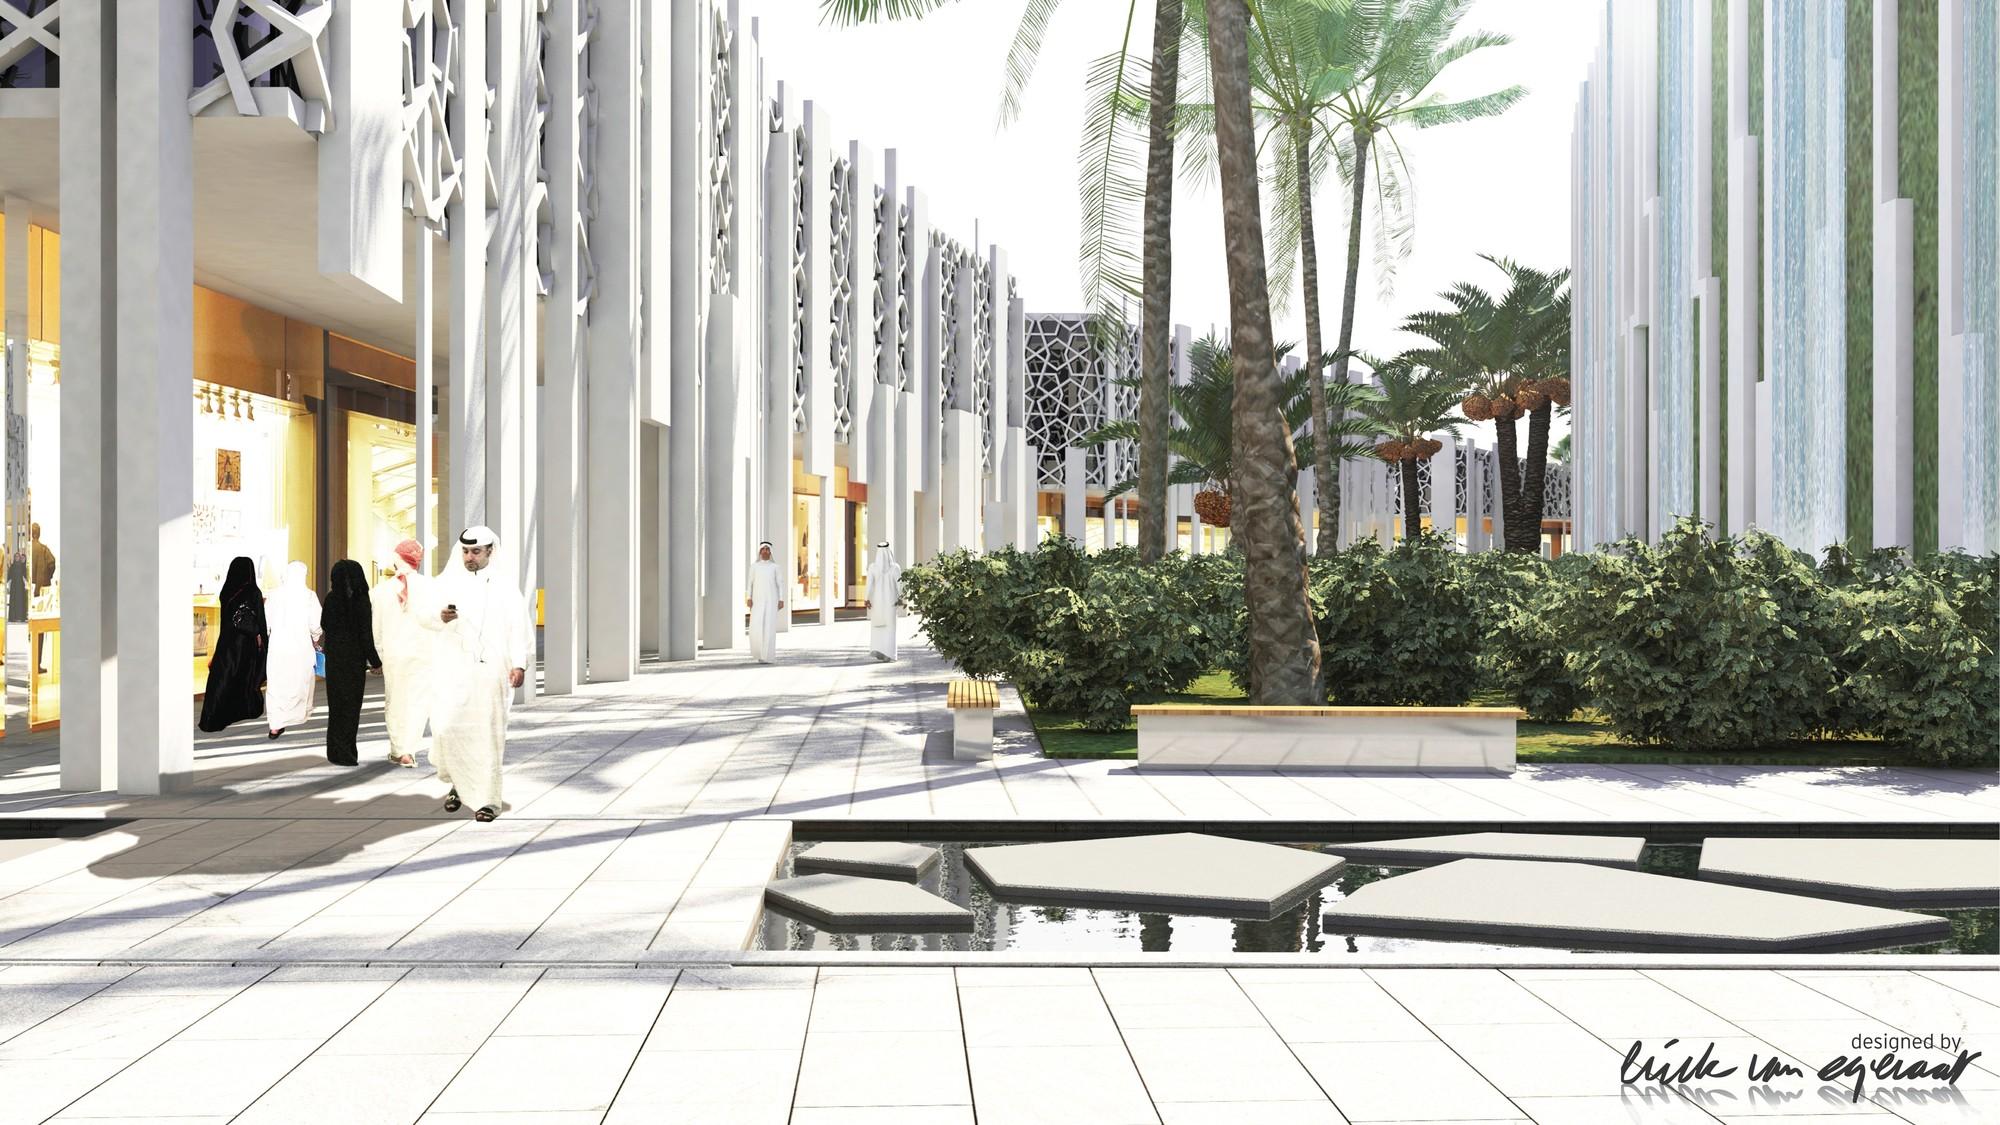 Shopping District. Image © (designed by) Erick van Egeraat BV